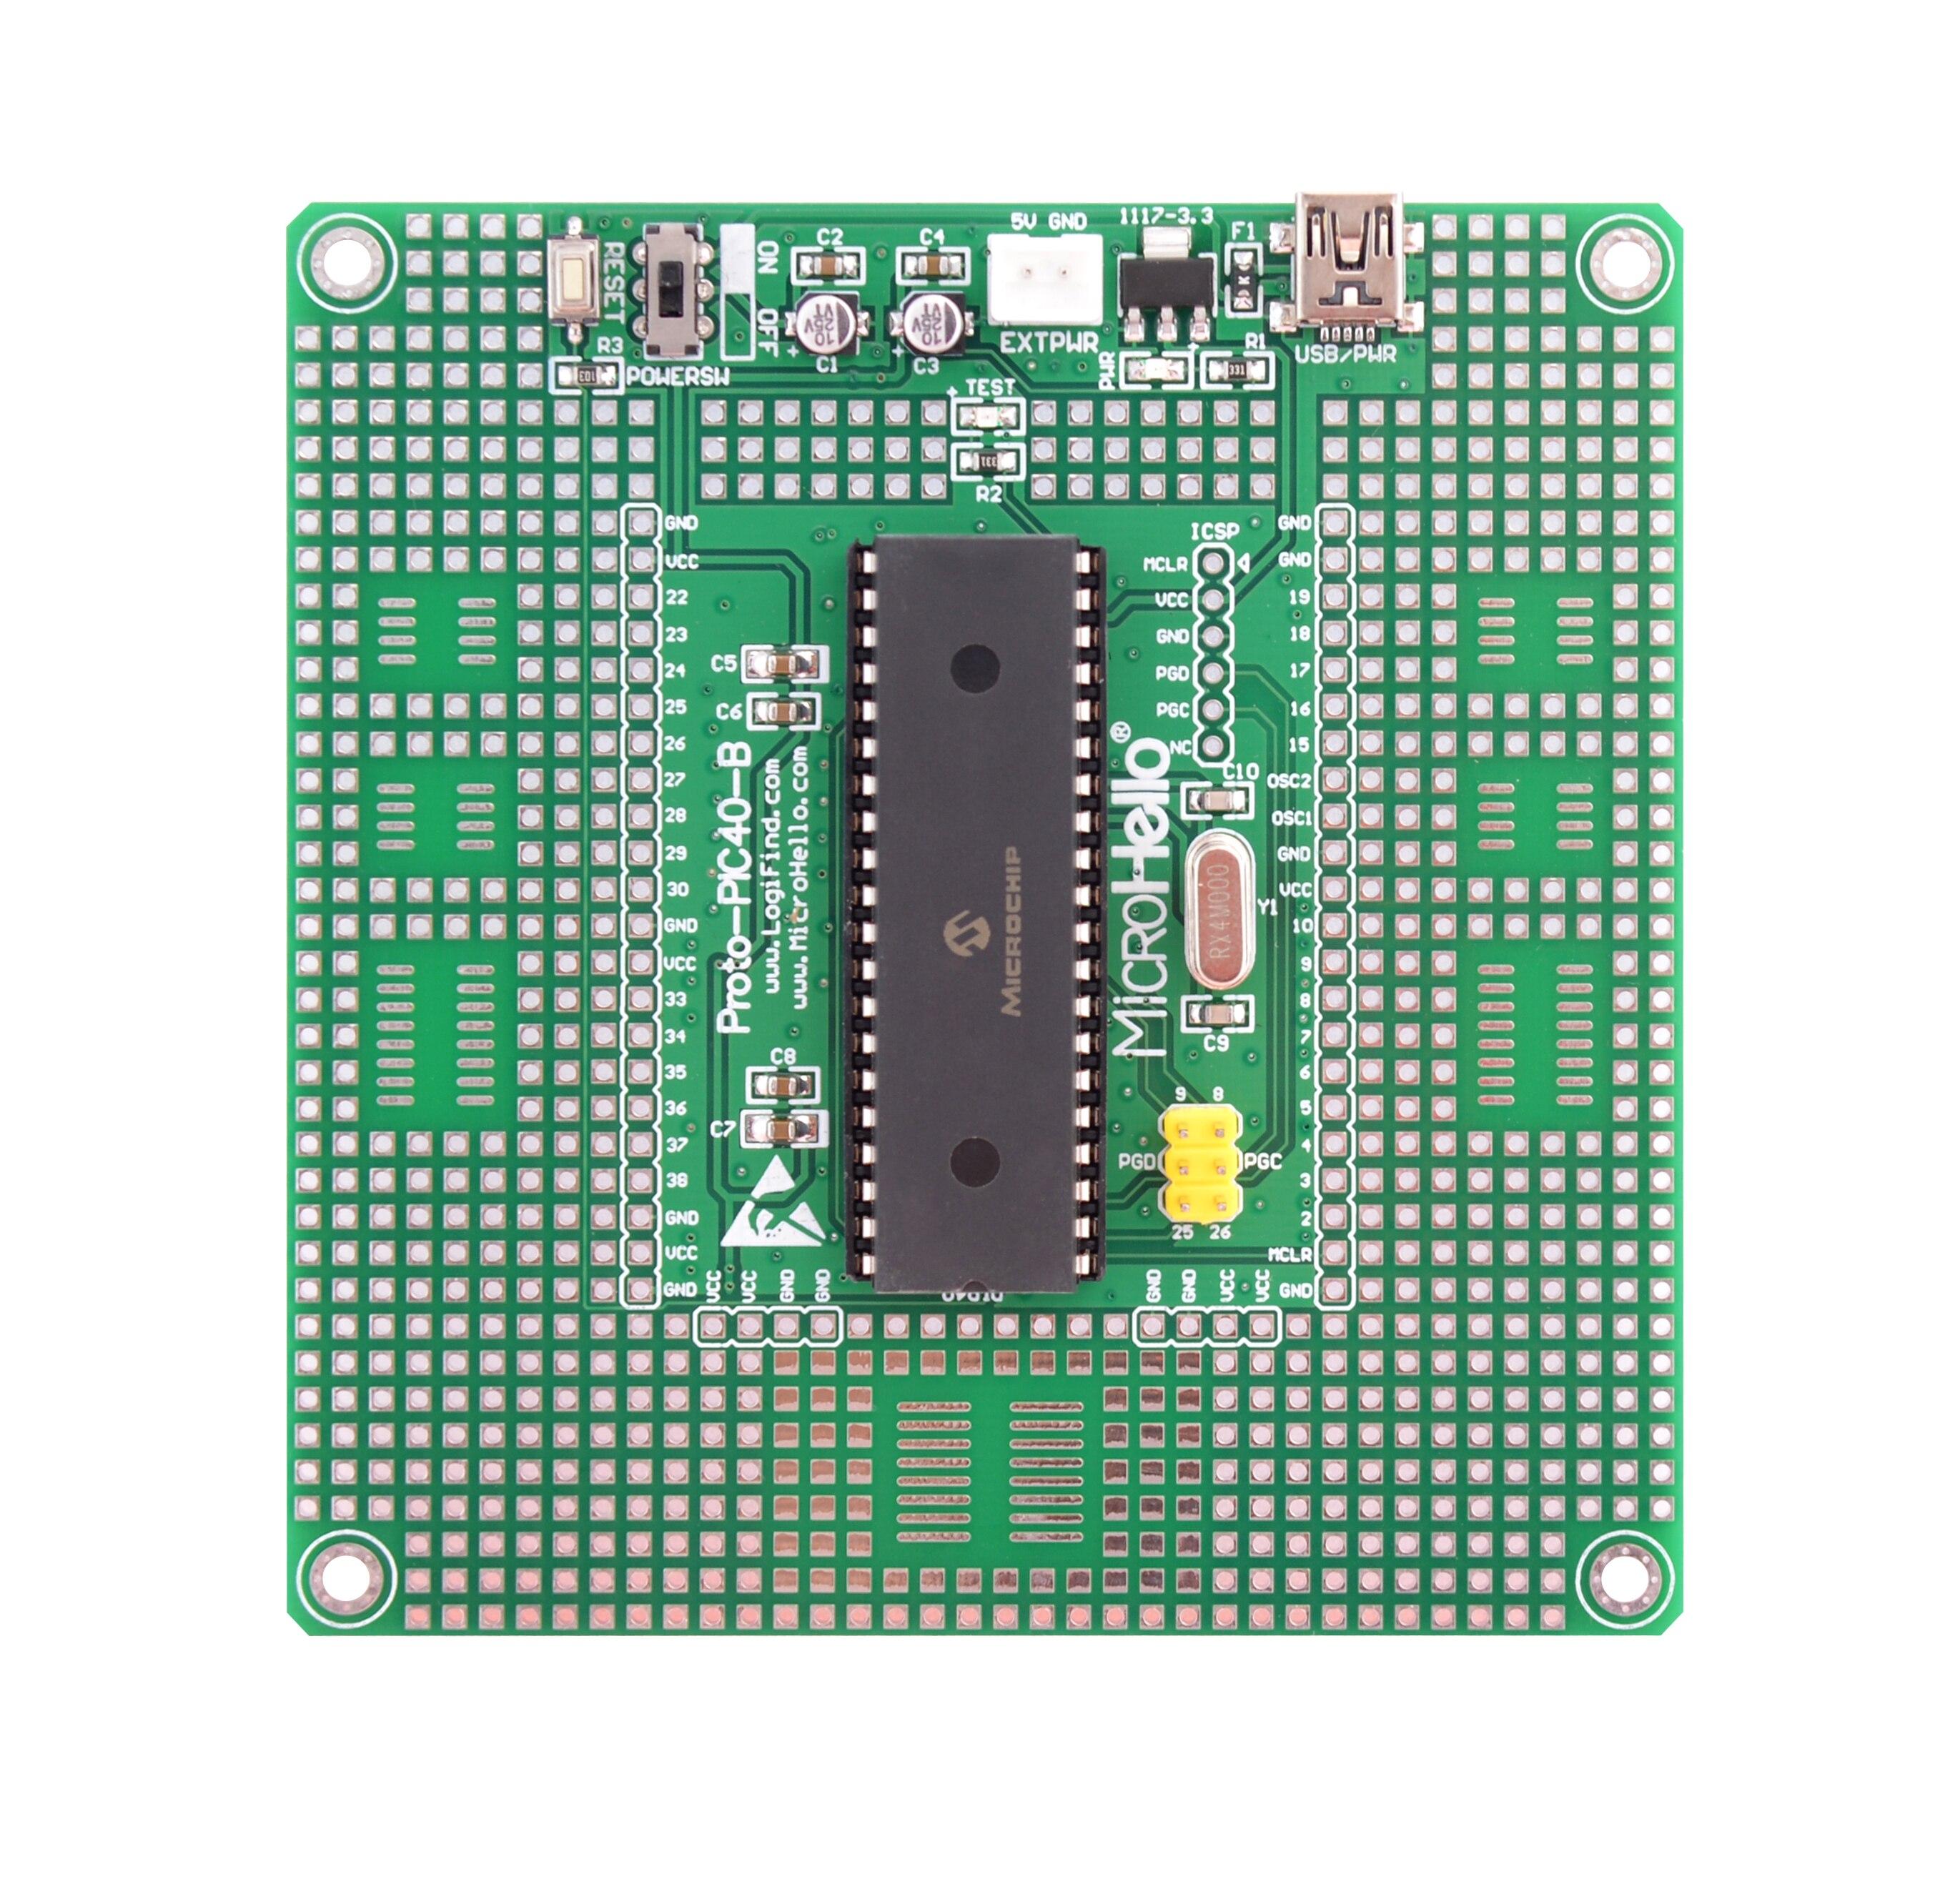 PIC dsPIC MCU التعلم مجلس التنمية ReadydsPIC-40P + dsPIC30F4011